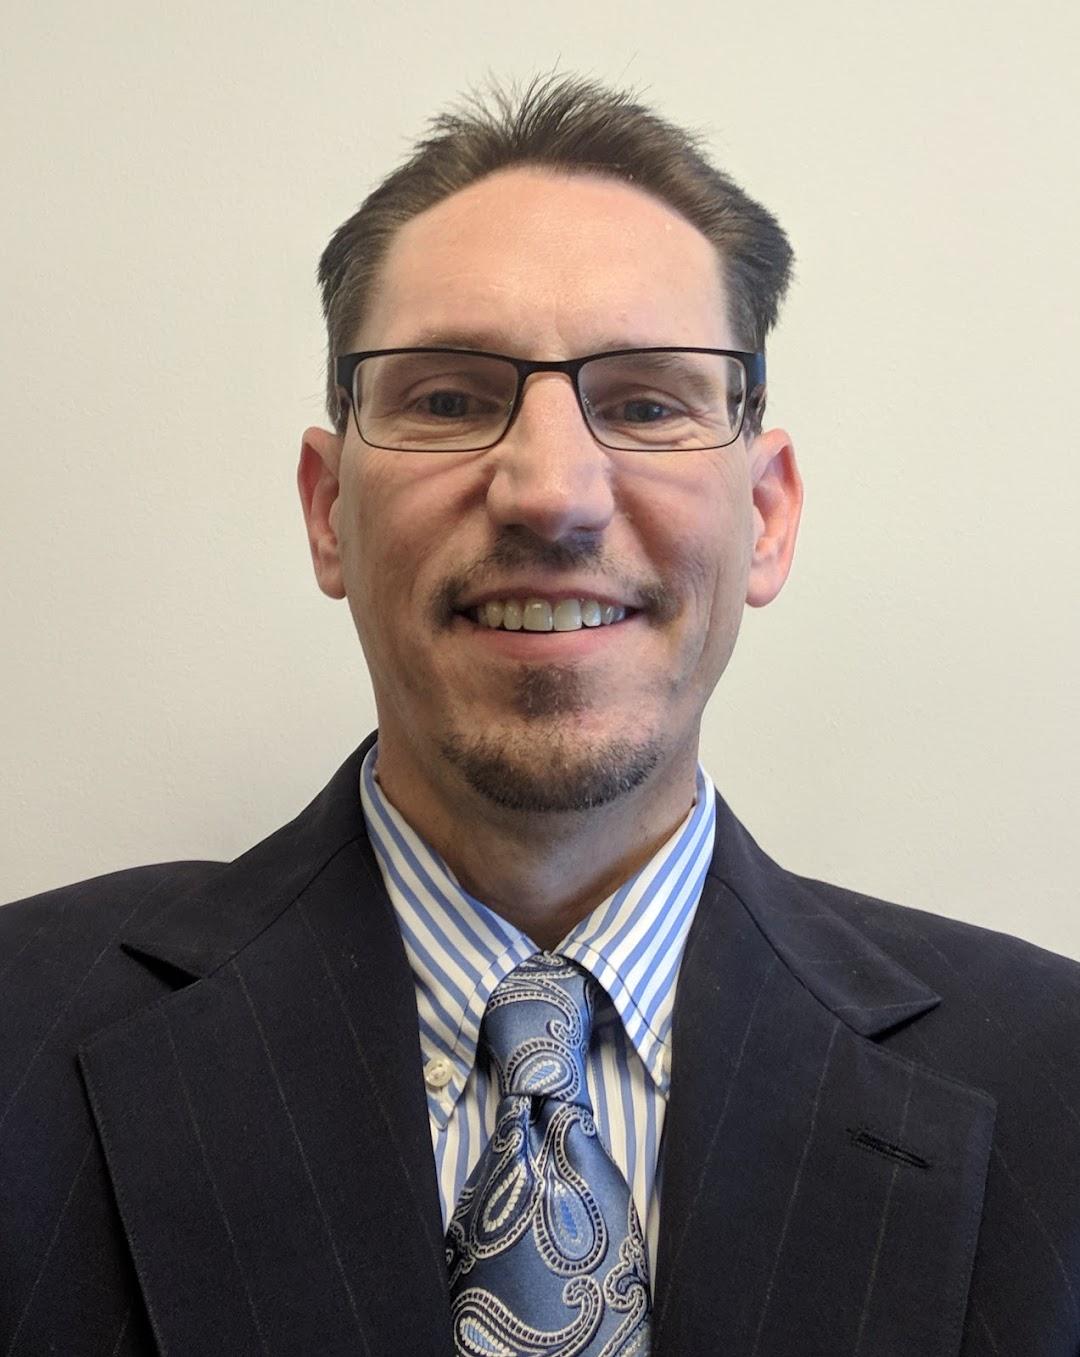 Xcellent Accounting Options, LLC